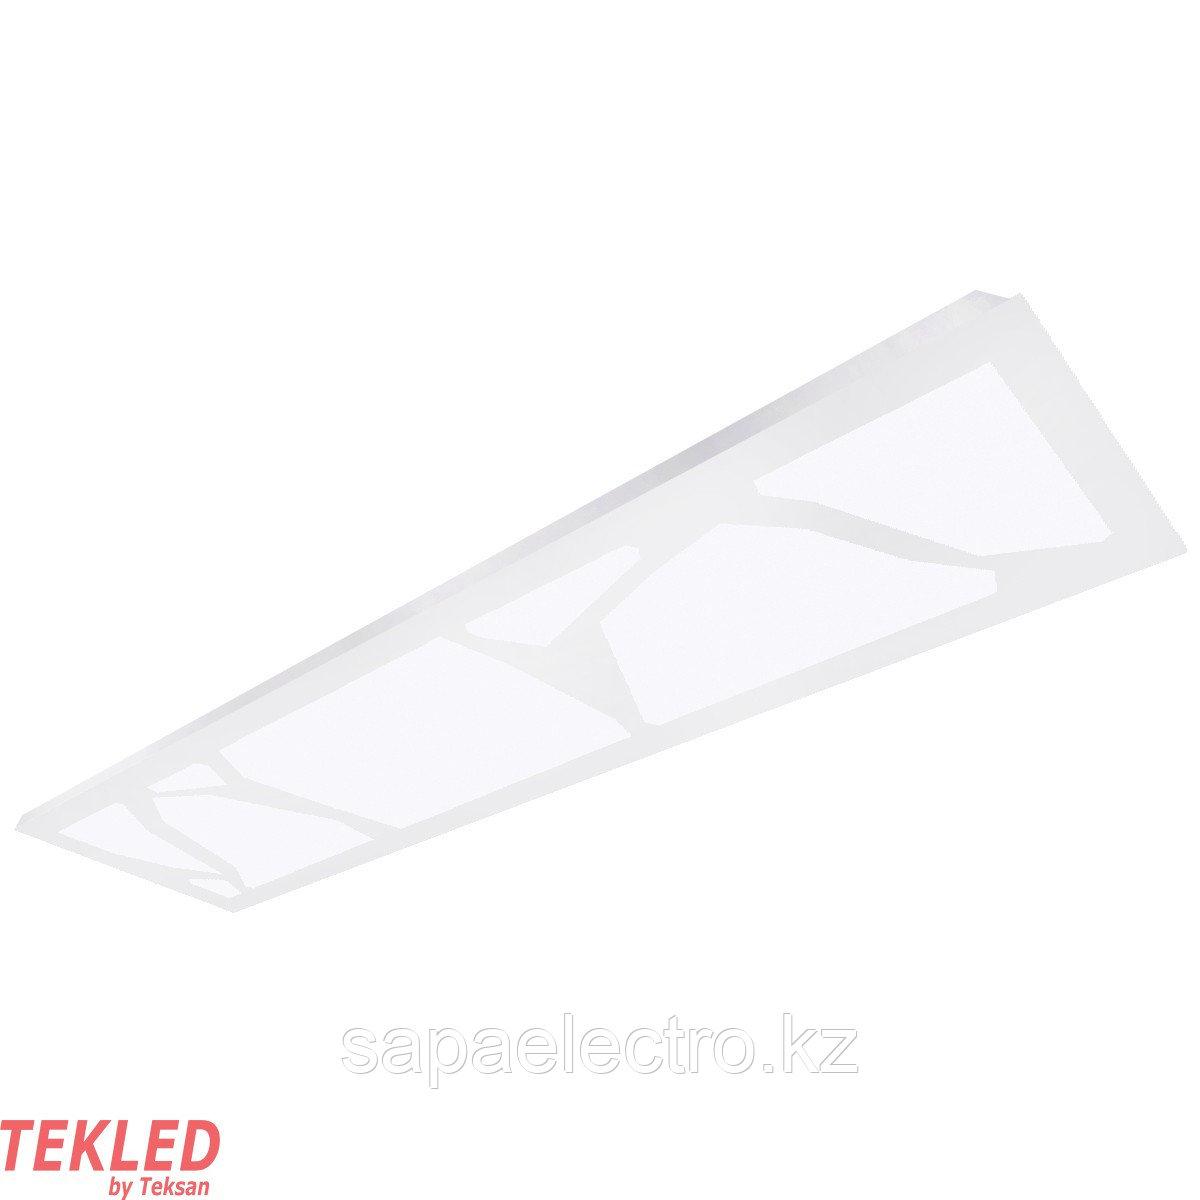 Св-к  OPALLED MARBLE 48W WH S/A  1200x300 5700K MGL